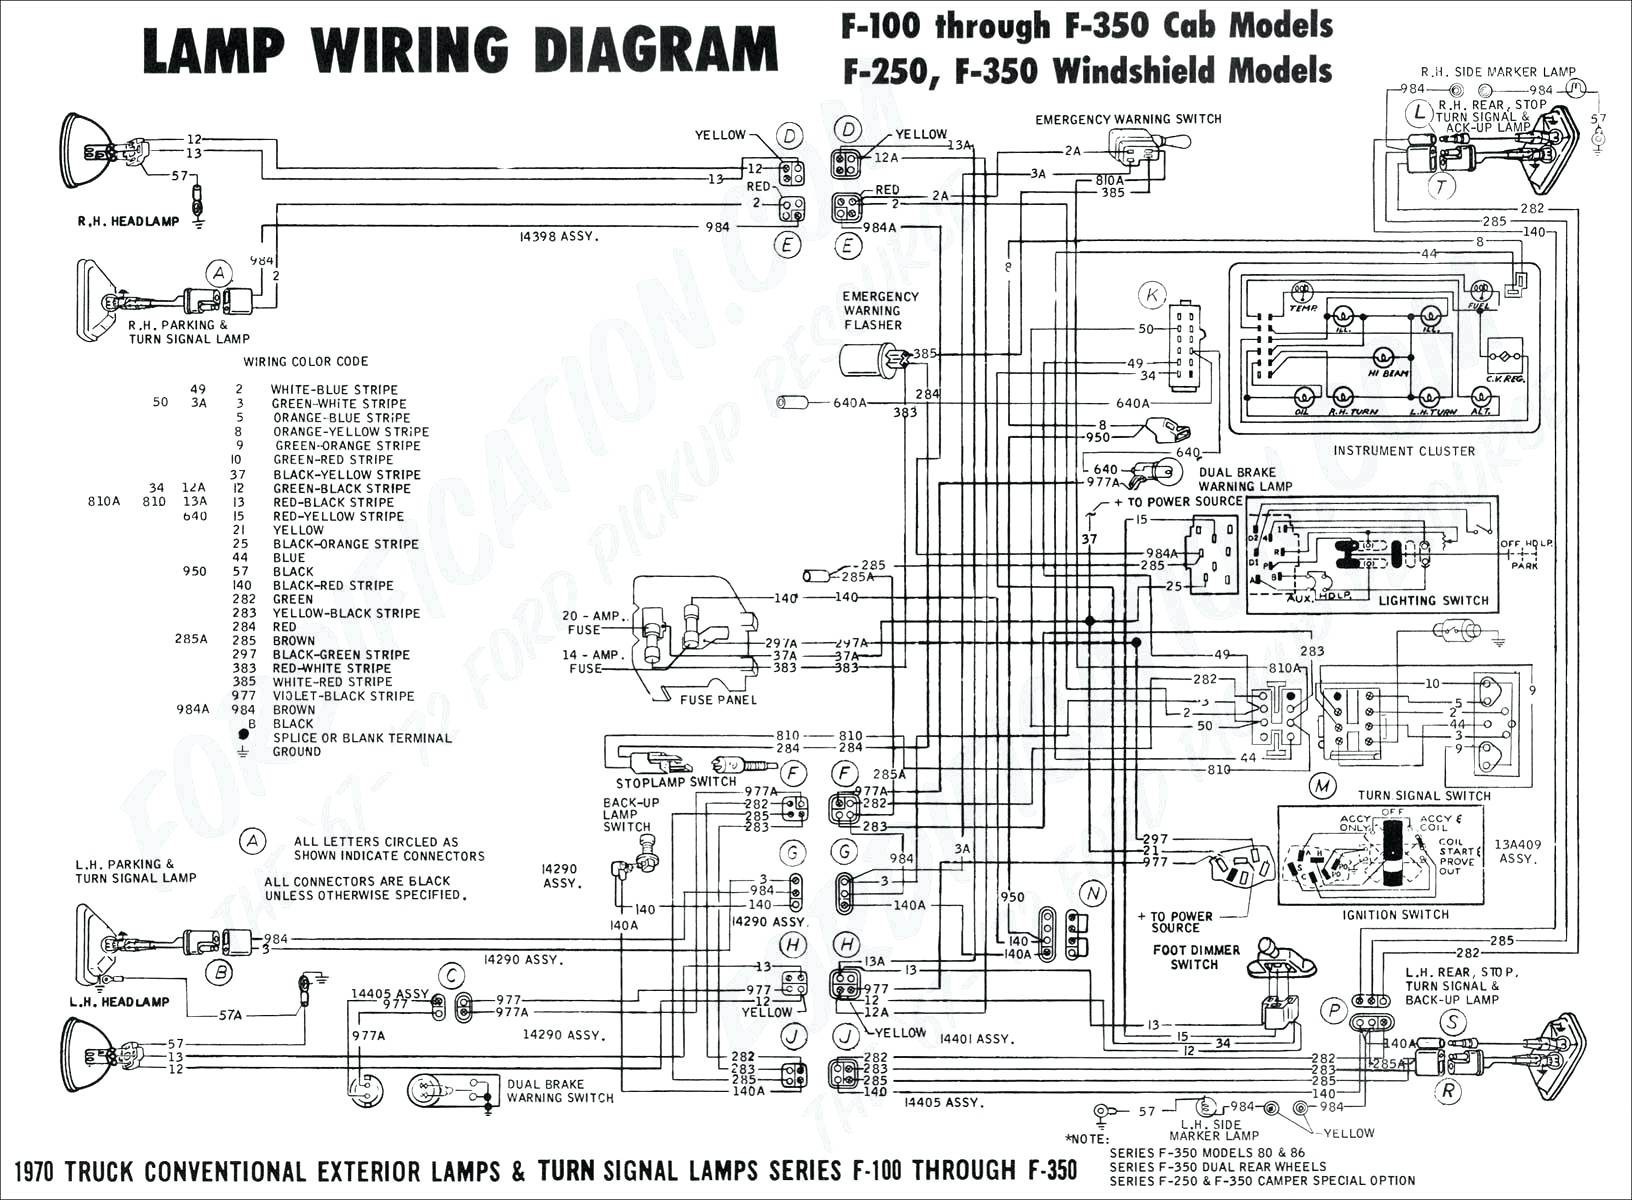 Truck Drivetrain Diagram Chevy Silverado Wiring Diagram for 1997 Best Truck Radio Suburban Of Truck Drivetrain Diagram